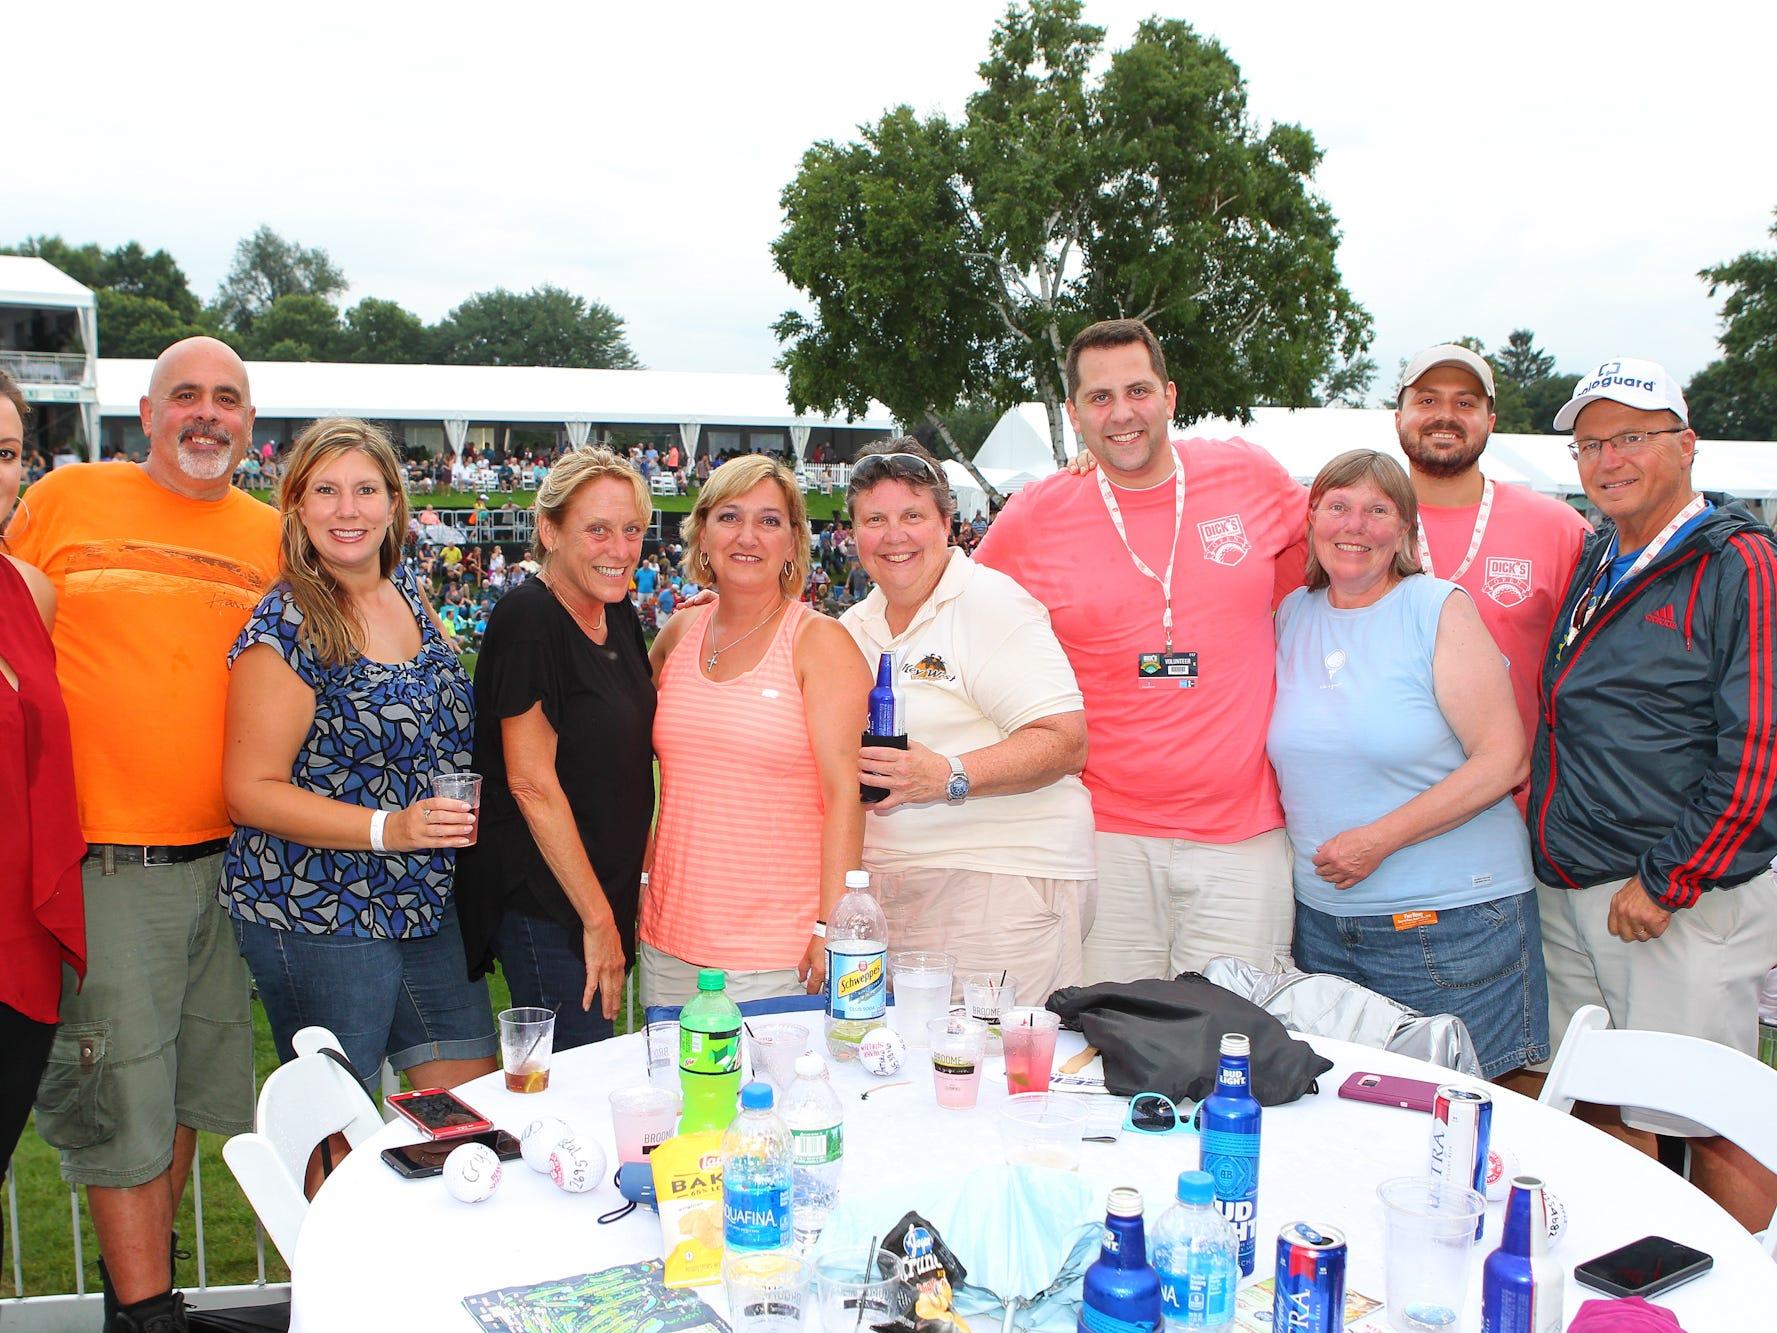 Mary, Doug, Crystal, Ivy, Gina, Kathy, Chris, Charlotte, Cal and Rick getting ready to enjoy the Blak Shelton concert.